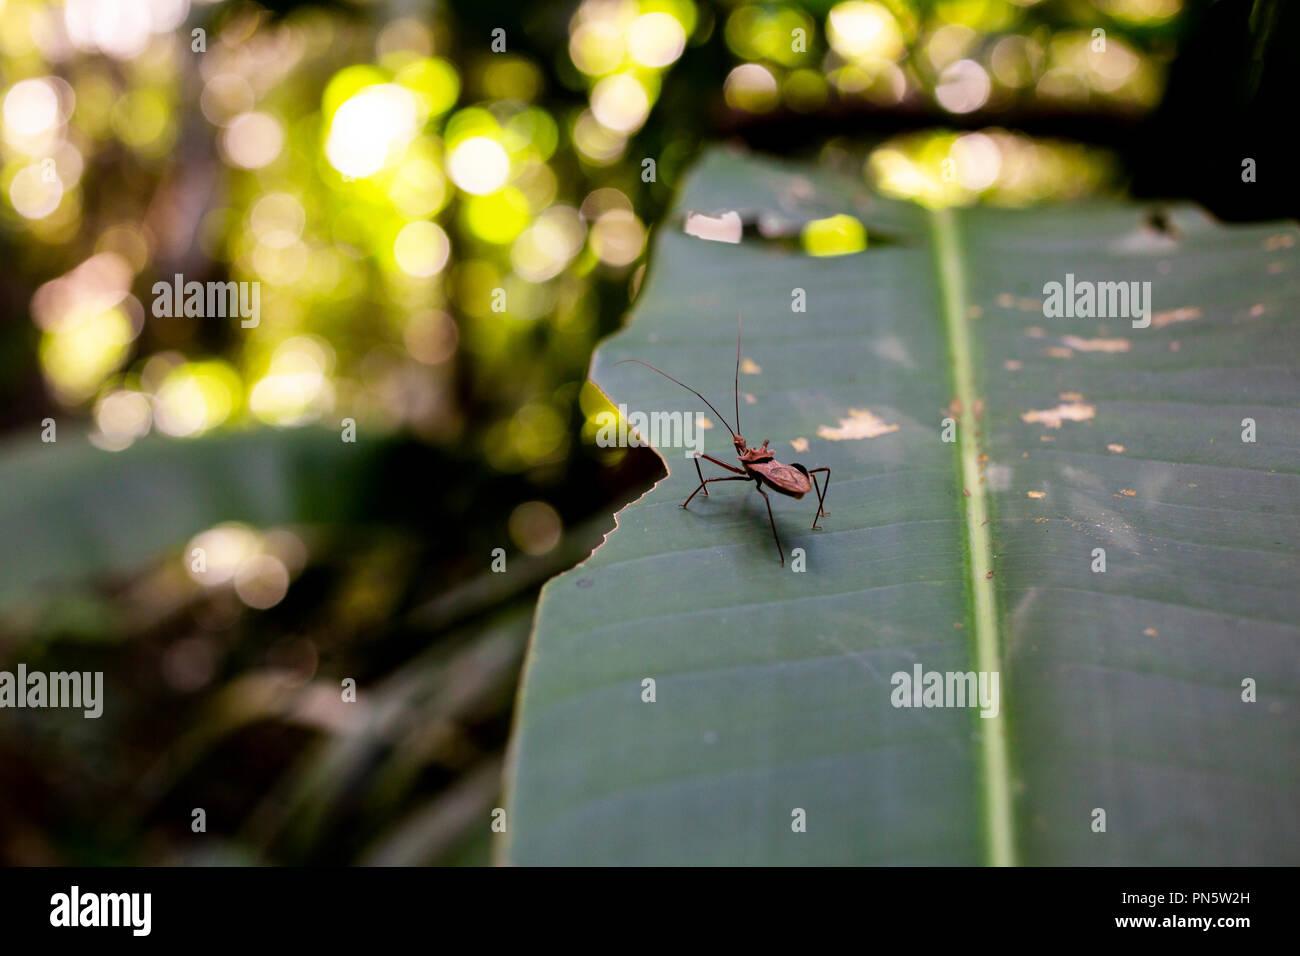 Insekt auf Pflanze , Blatt im Regenwald bei Puerto Maldonado, Rio Madre de Dios, Peru - Stock Image